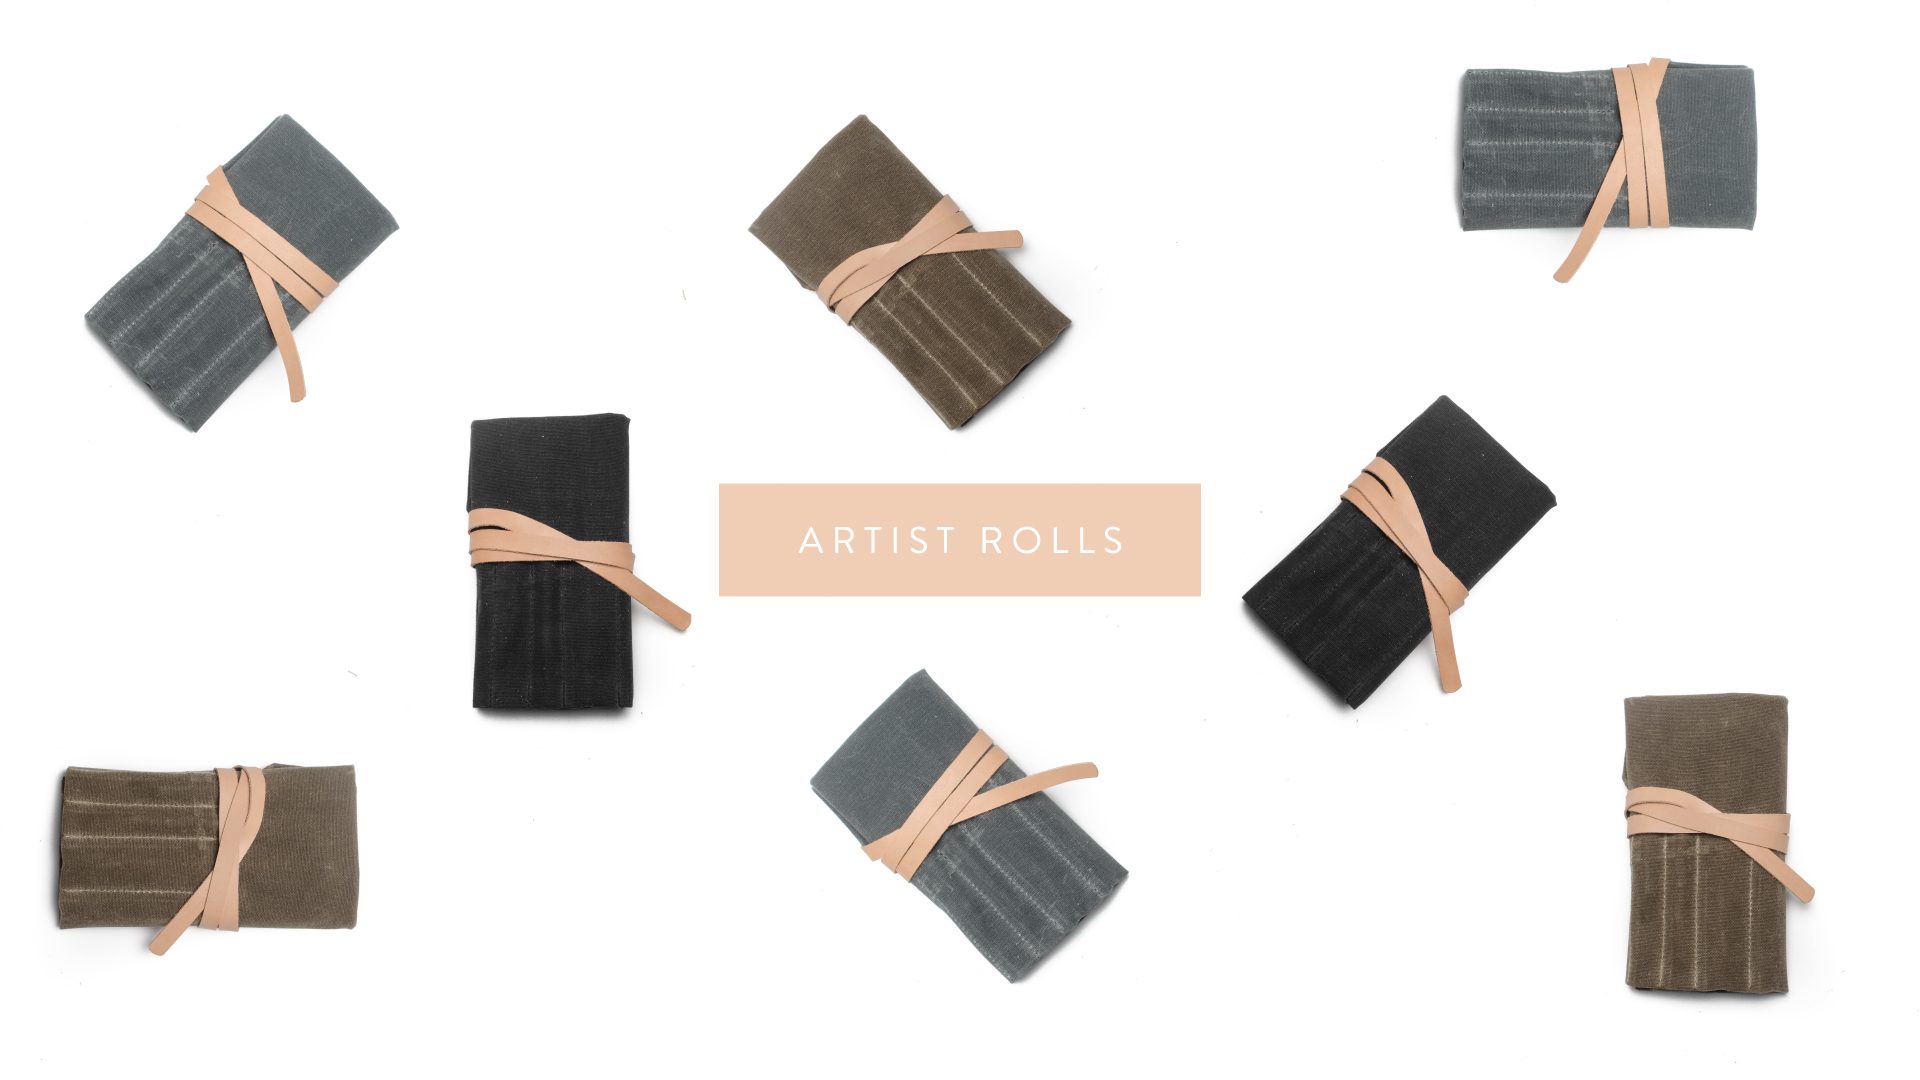 ARTIST-ROLLS.jpg